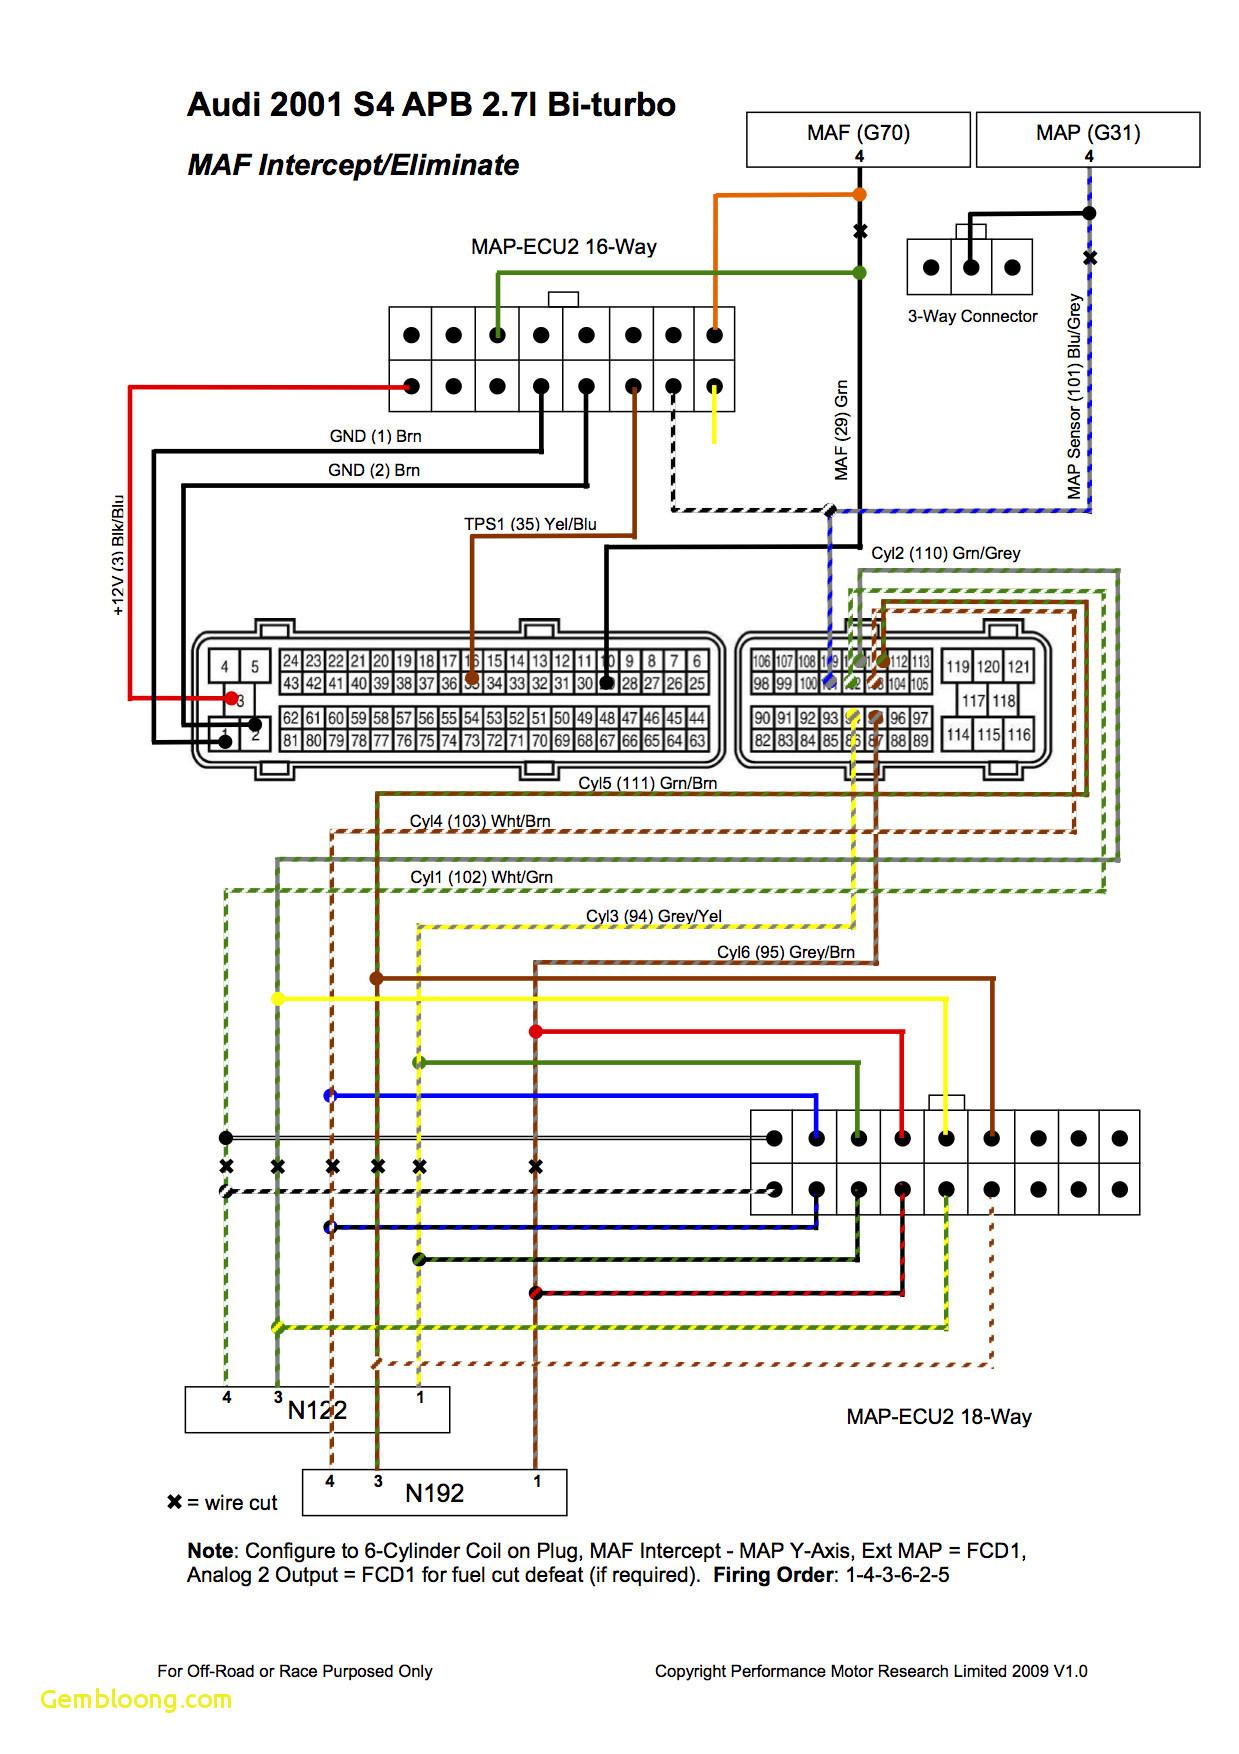 Ecm Wiring Diagram | Manual E-Books - Ecm Wiring Diagram